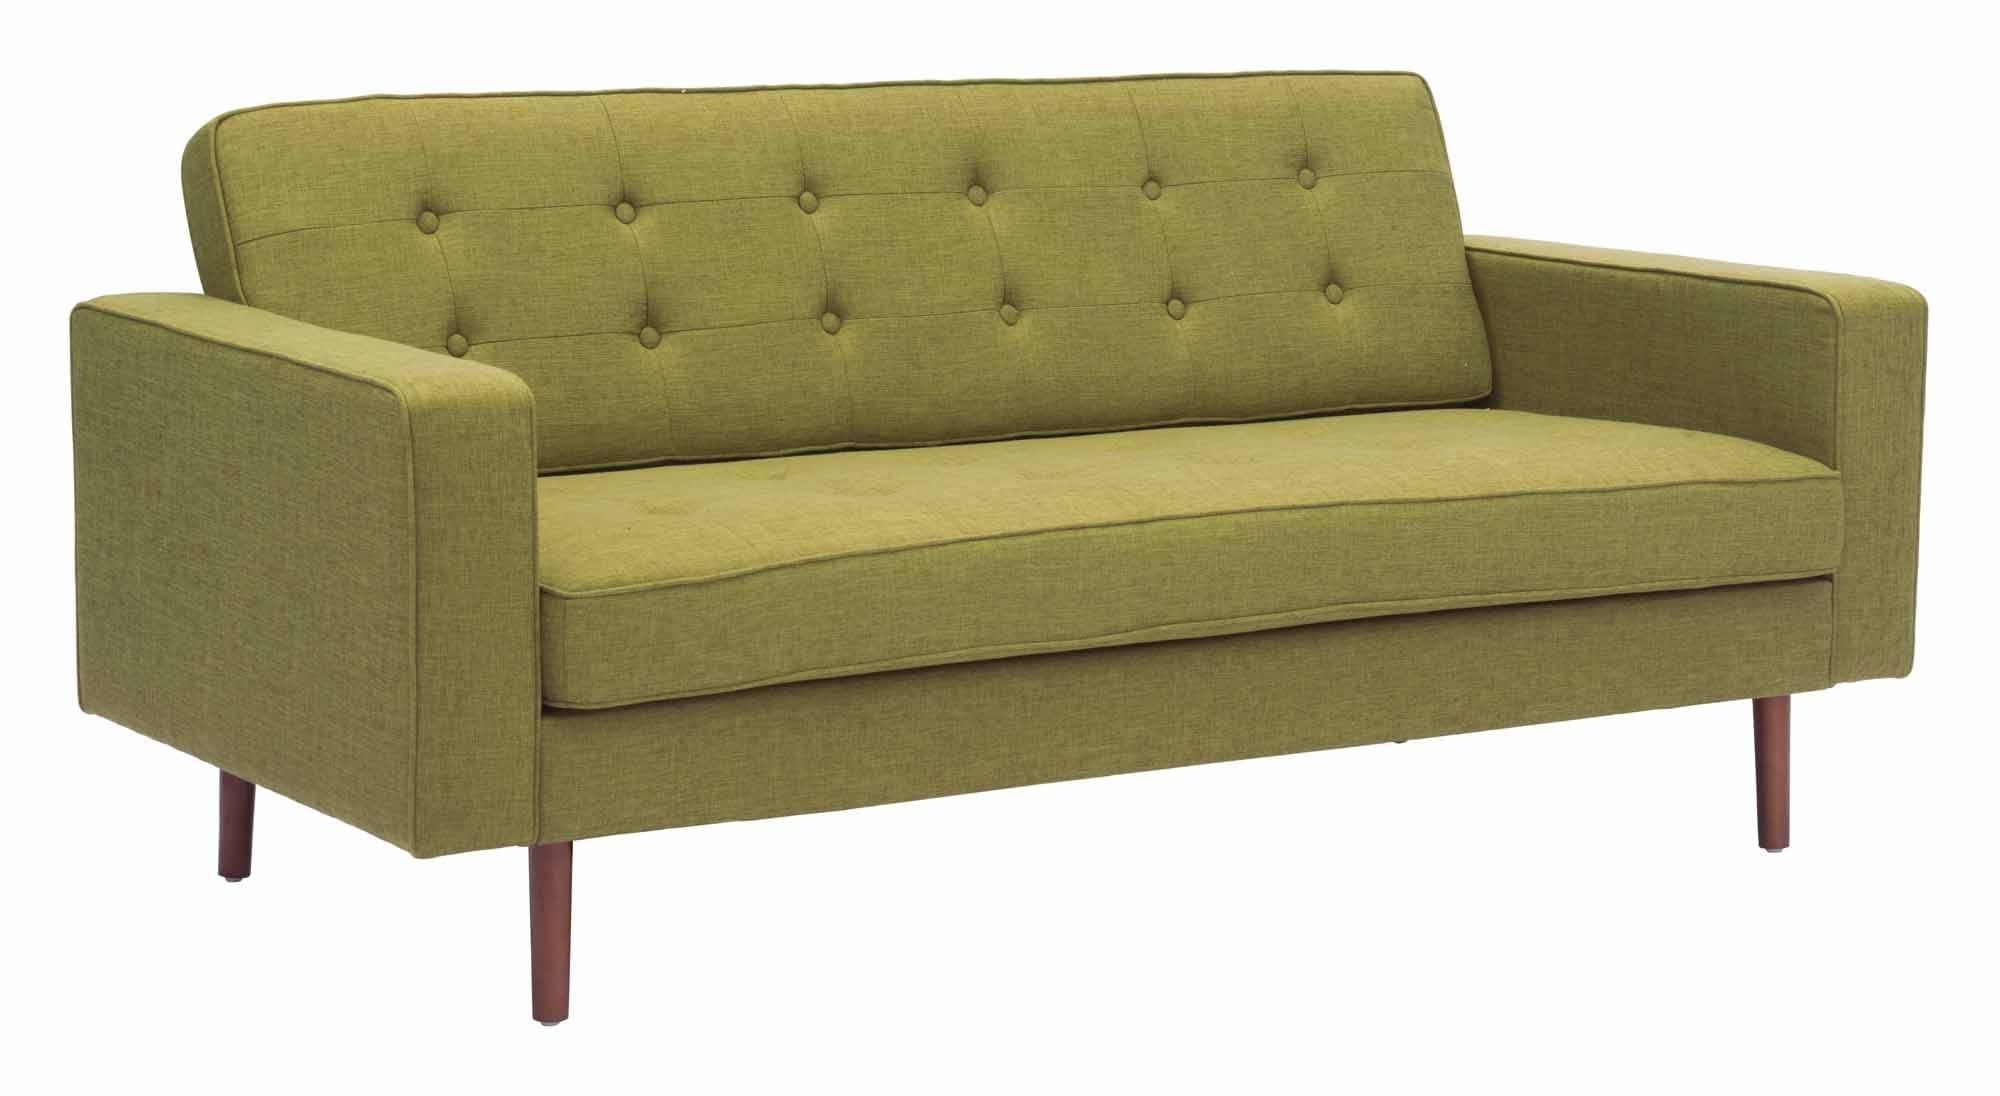 Modern Furniture Edison Nj puget sofa greenzuo modern